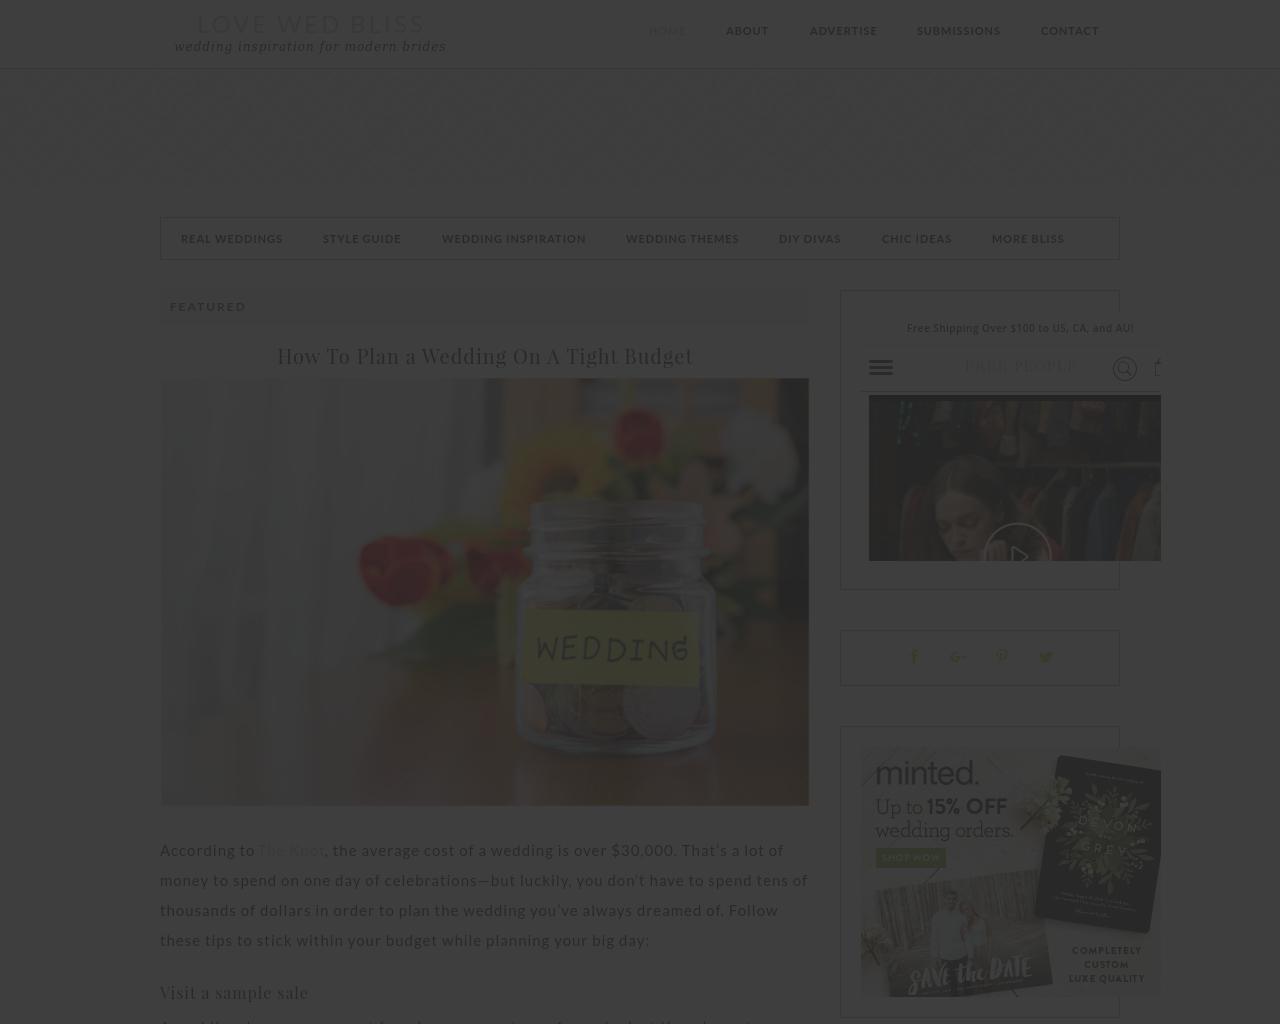 Lovewedbliss-Advertising-Reviews-Pricing